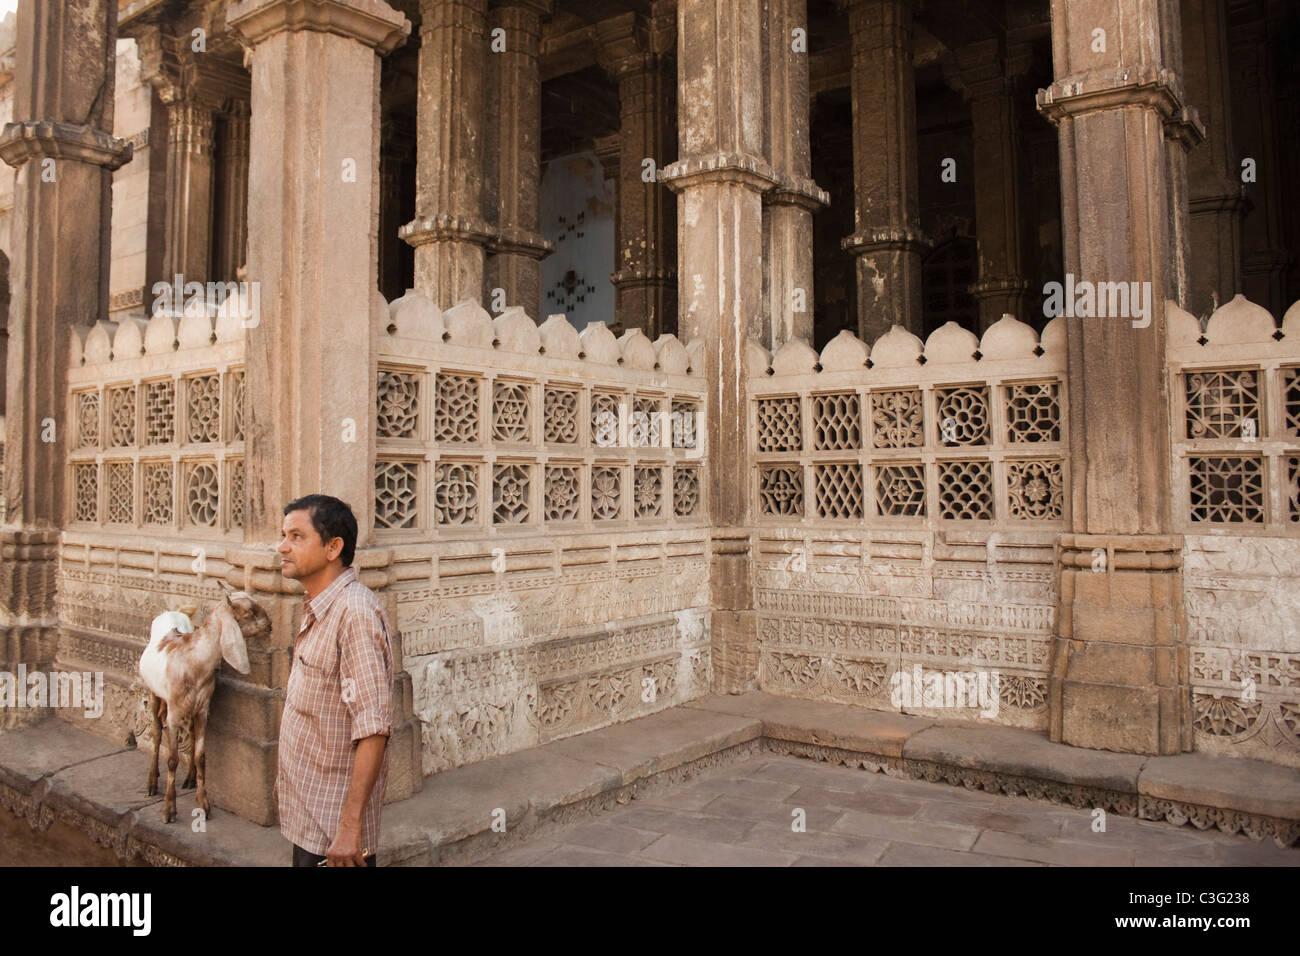 Man standing near a building, Ahmedabad, Gujarat, India - Stock Image